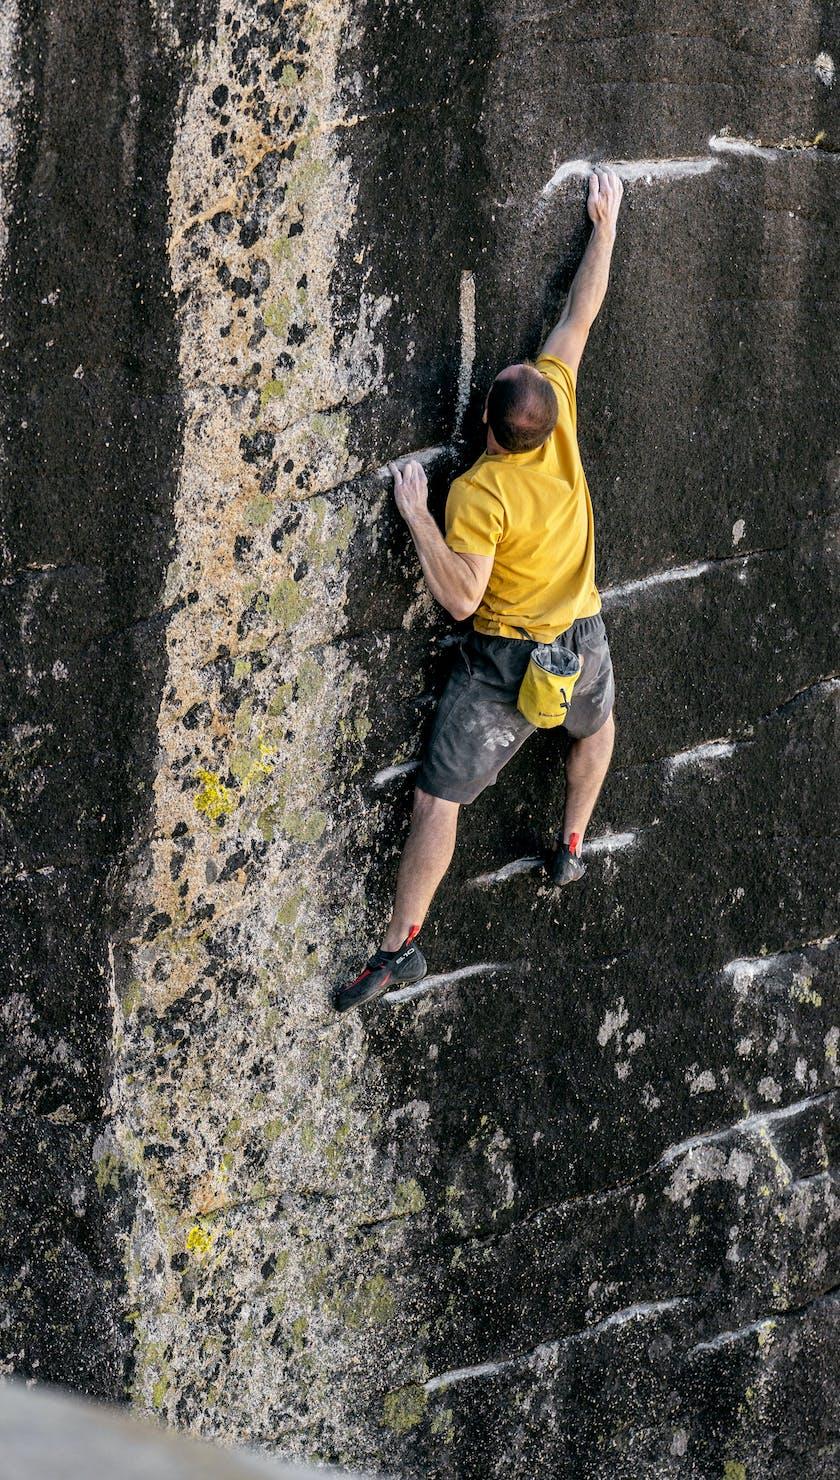 Carlo Traversi climbing a route